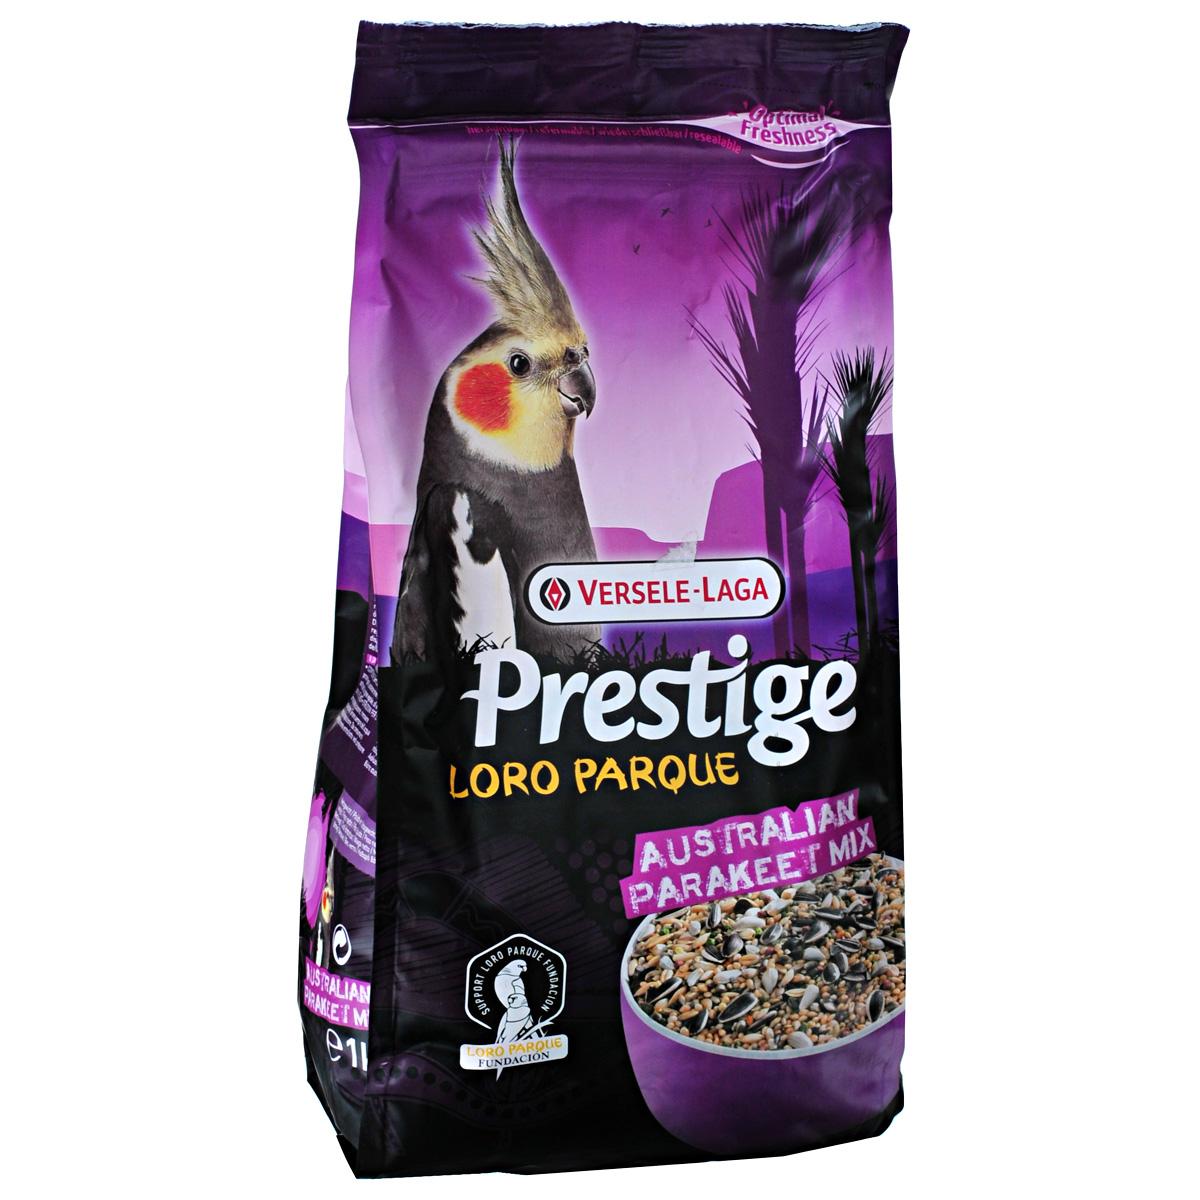 Корм для средних австралийских попугаев Versele-Laga Australian Parakeet, 1 кг корм для волнистых попугаев versele laga prestige budgies 1 кг